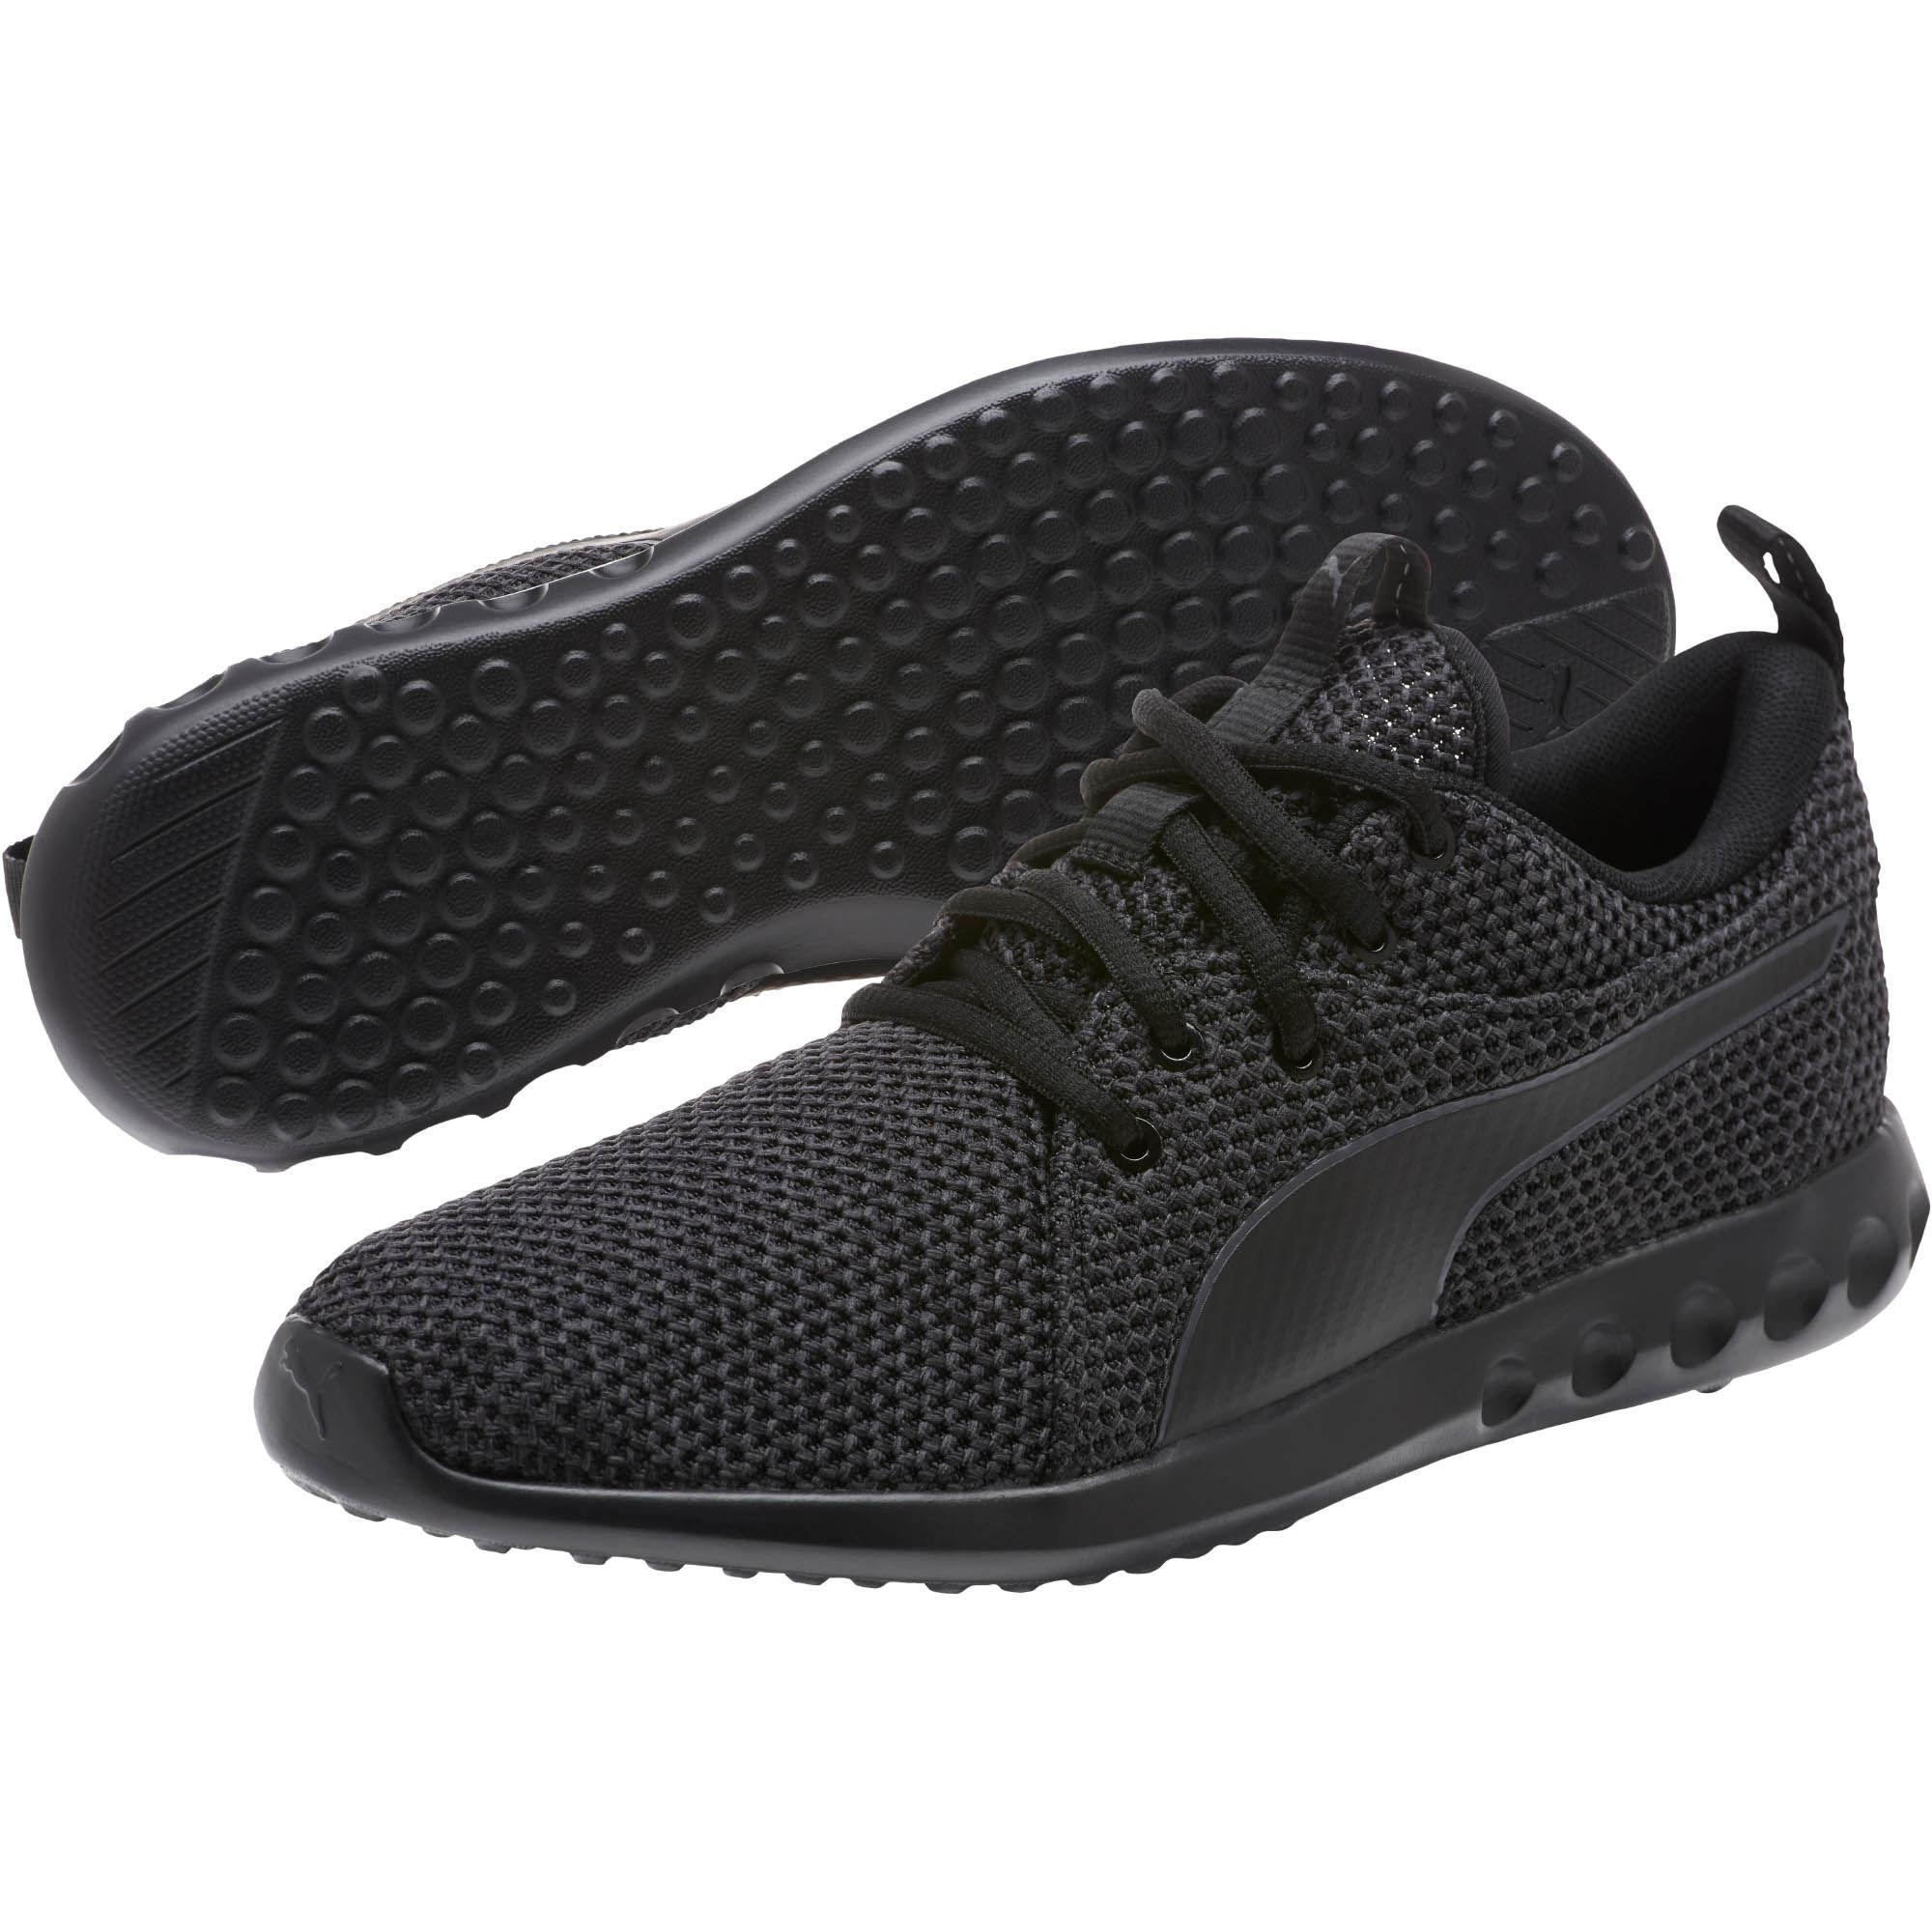 697572b46058 PUMA - Black Carson 2 Nature Knit Women s Running Shoes - Lyst. View  fullscreen